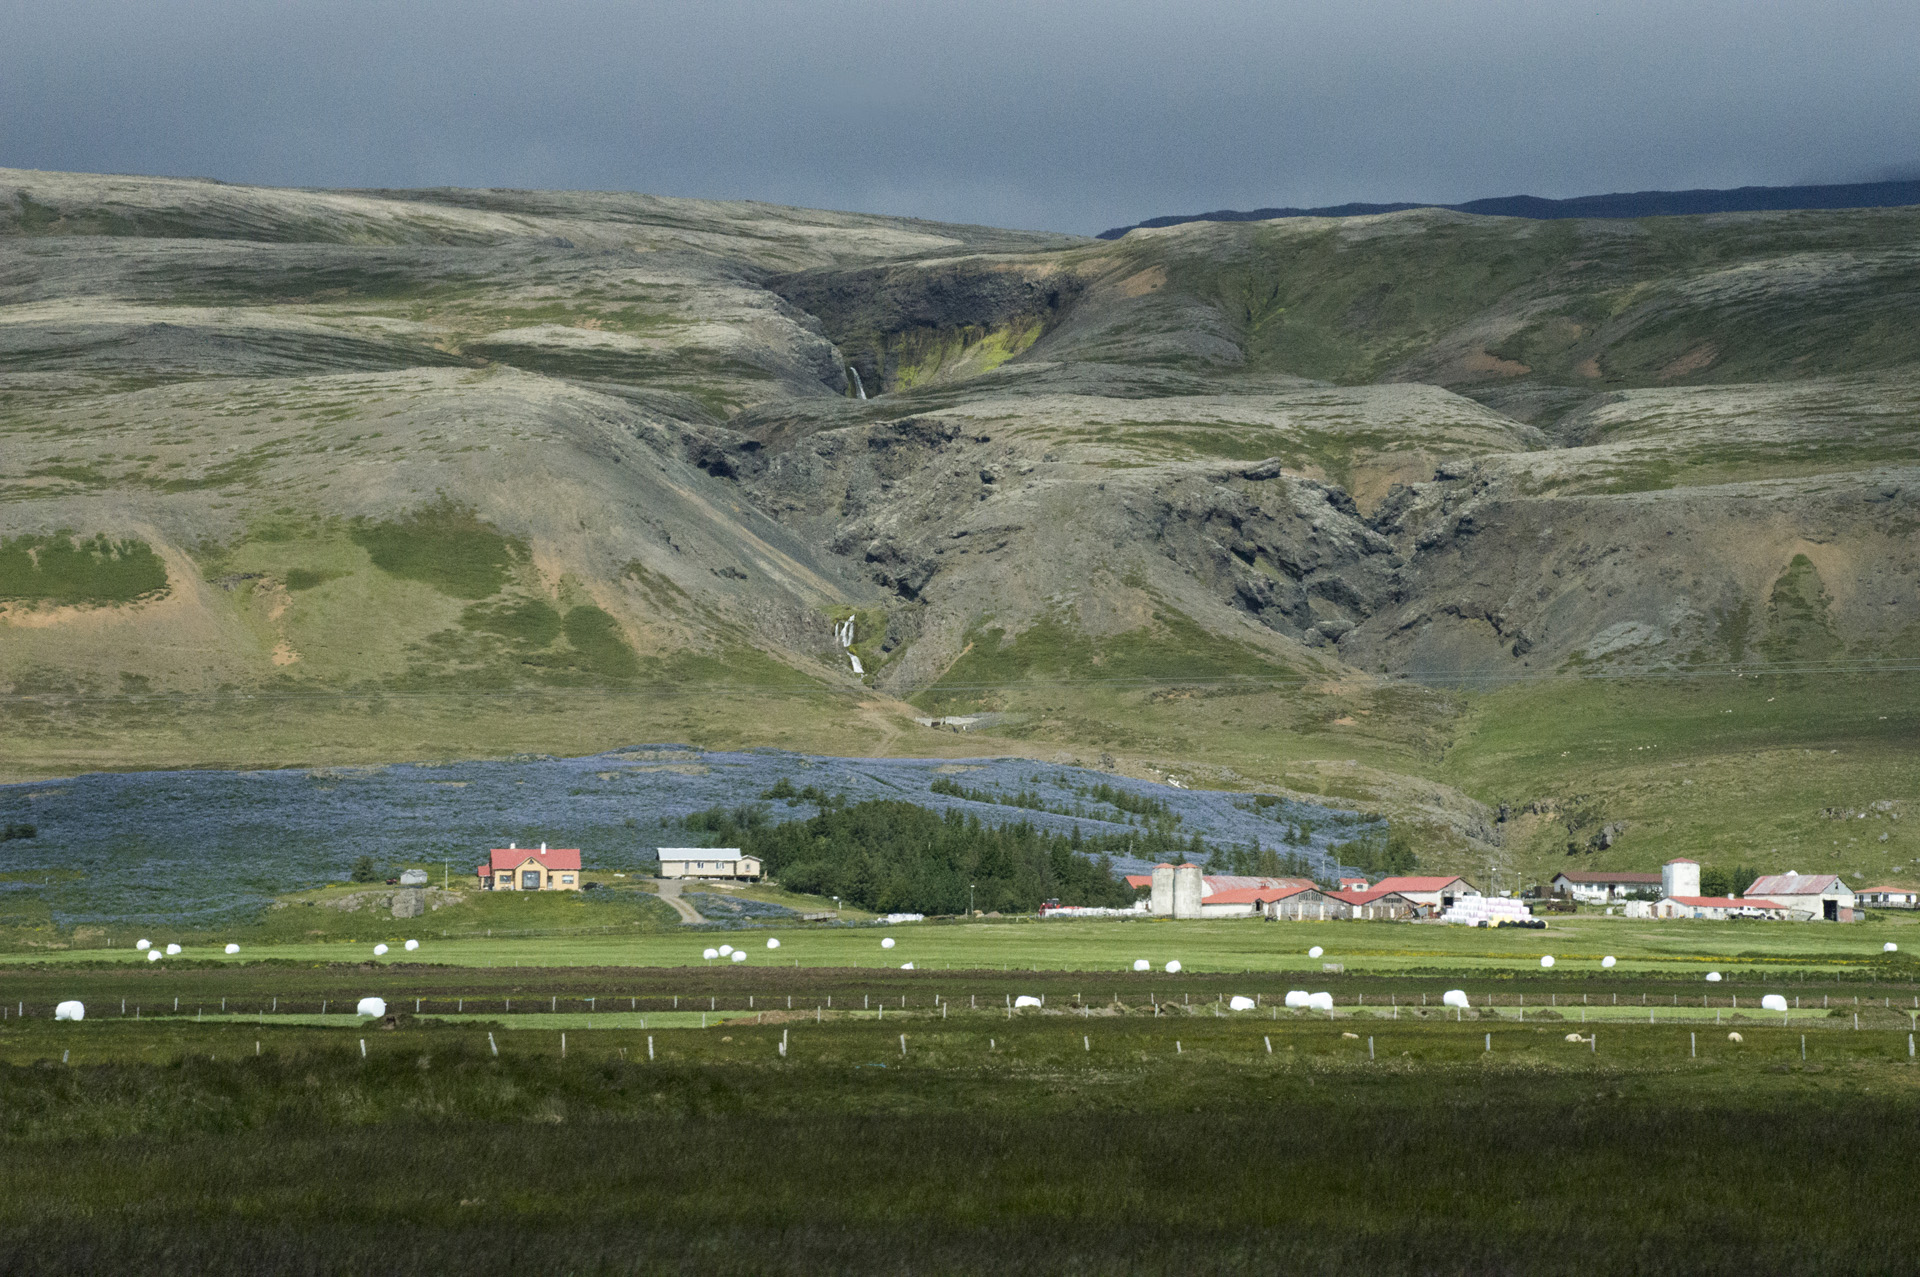 Nookta lupine flowers bloom behind a farm at the base of Rófuborg mountain, Vesturland region, Iceland.